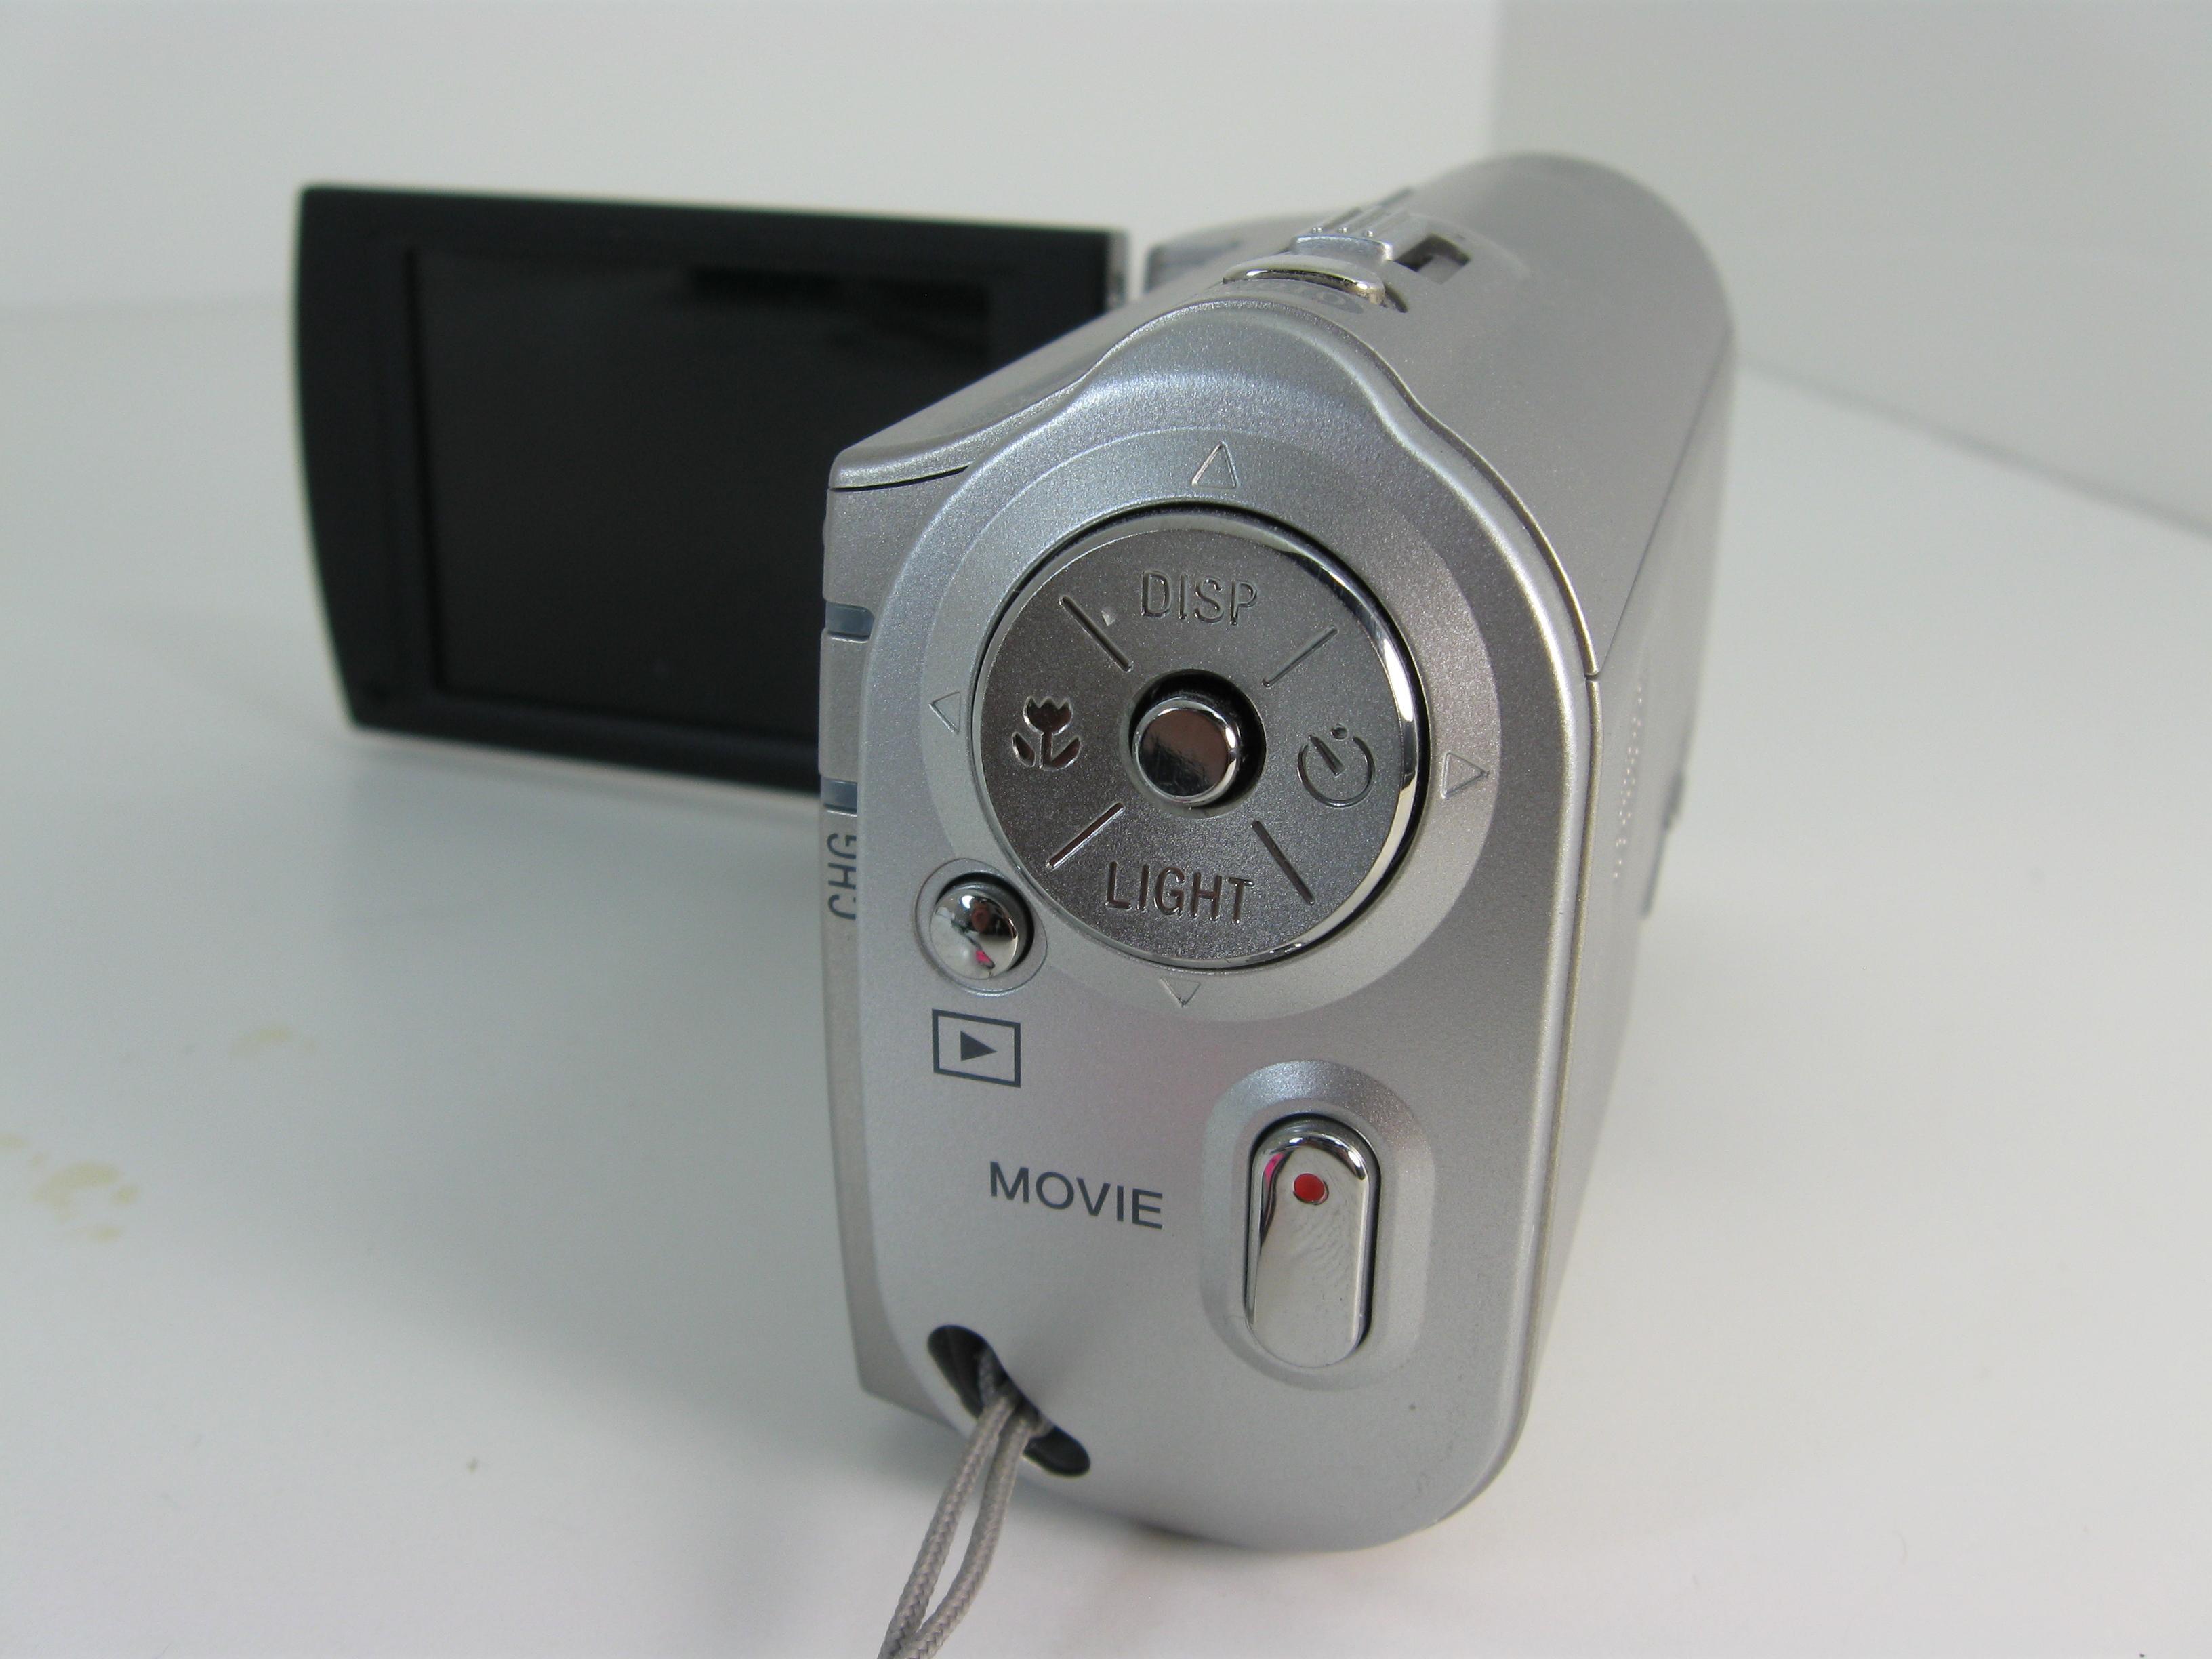 Samsung Pixon12 M8910 Review - Camera and Multimedia